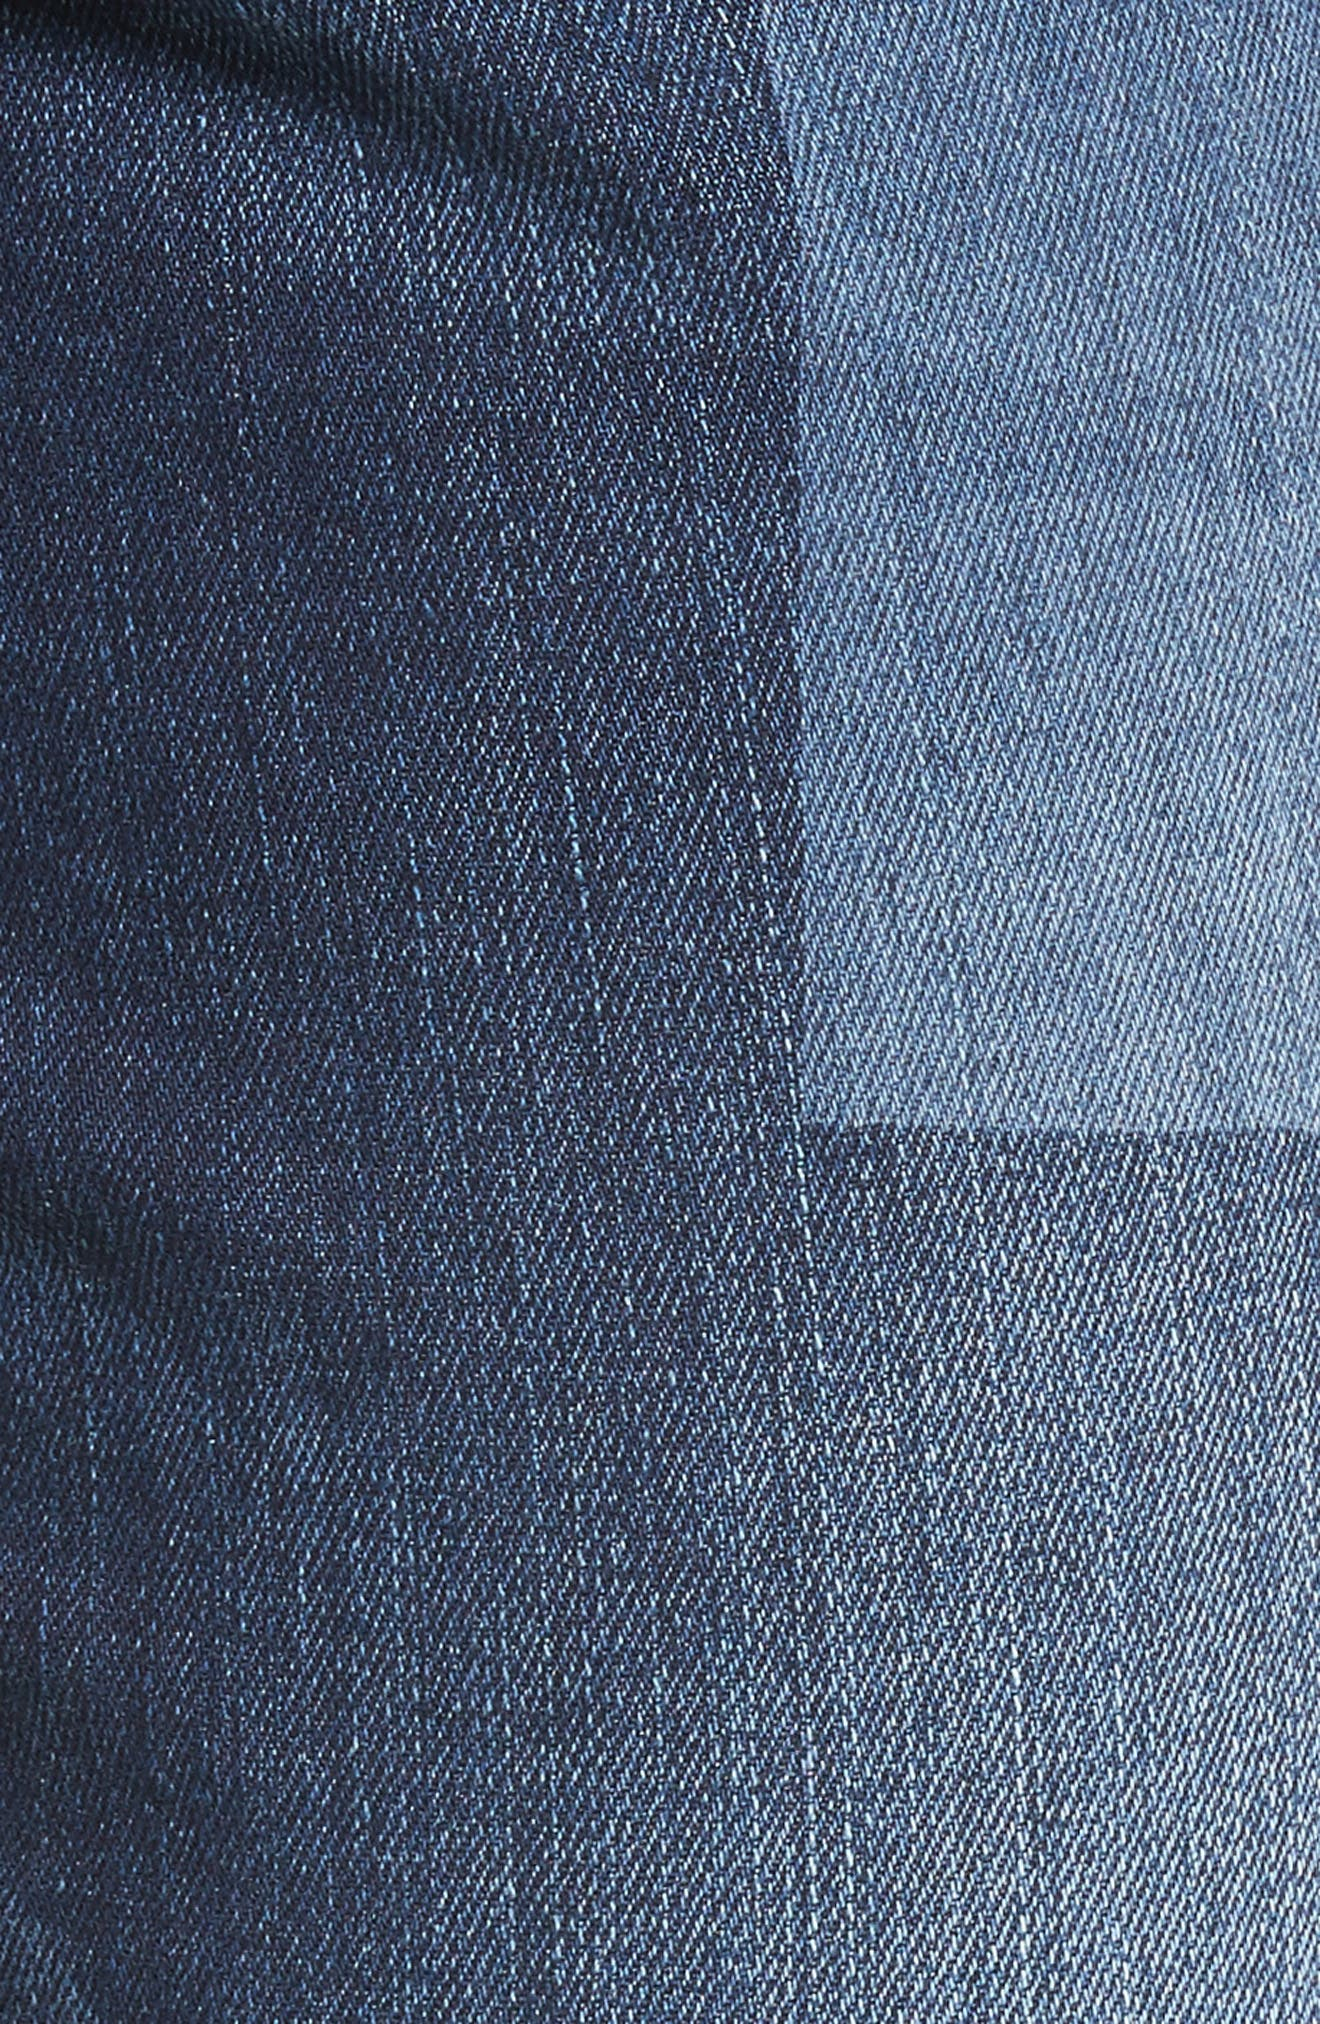 Mera Skinny Ankle Jeans,                             Alternate thumbnail 4, color,                             Bucket Blue